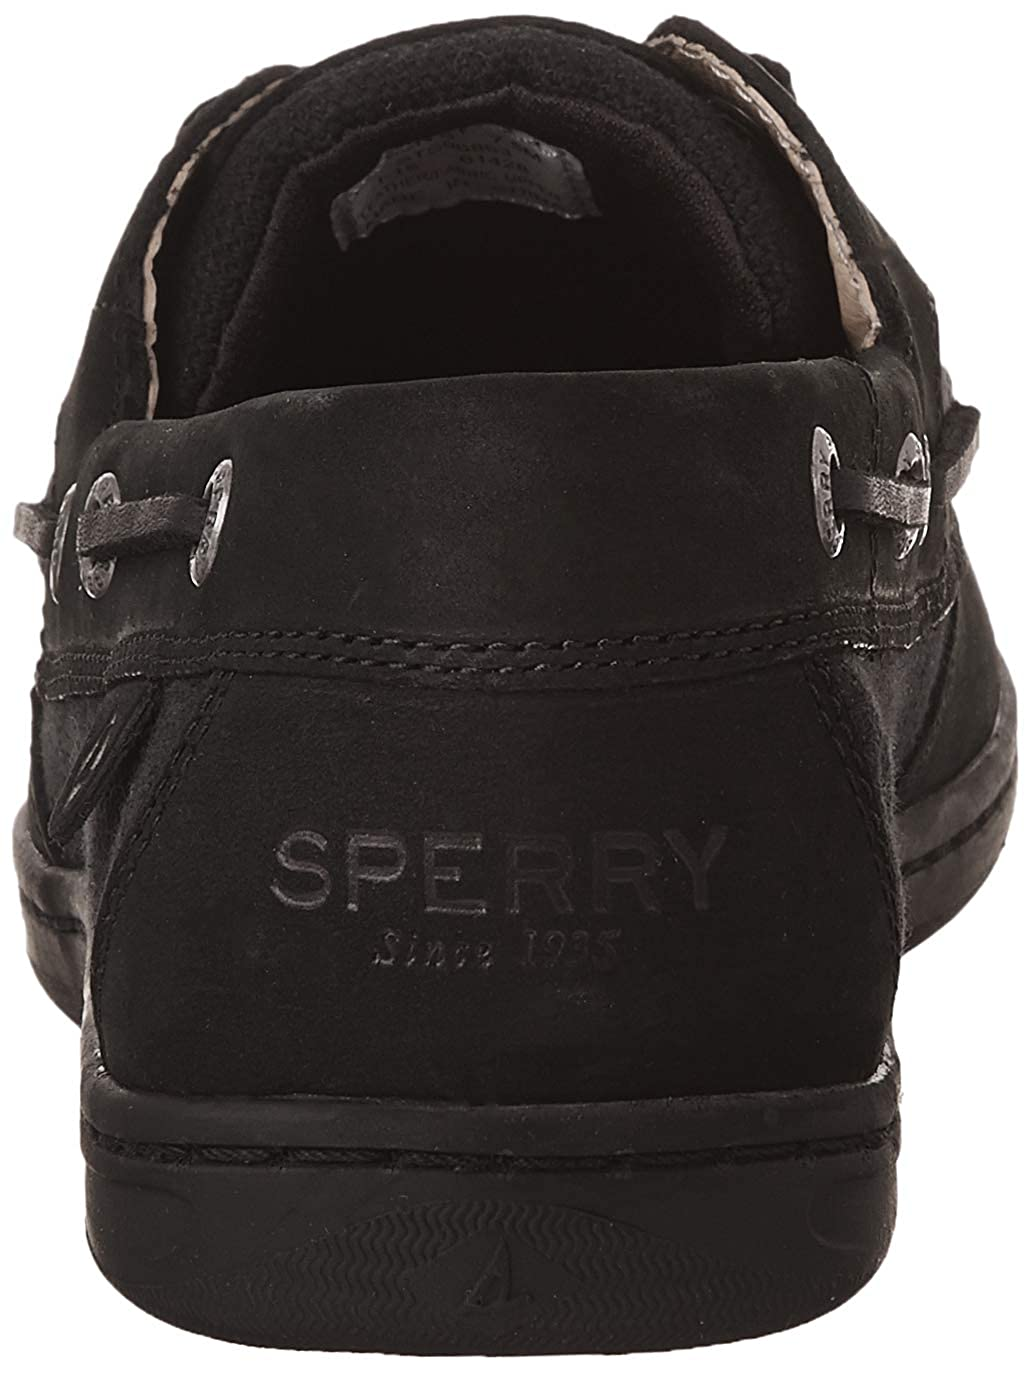 Sperry Sperry Sperry Top-Sider Woherren Koifish Boat schuhe, ad92da